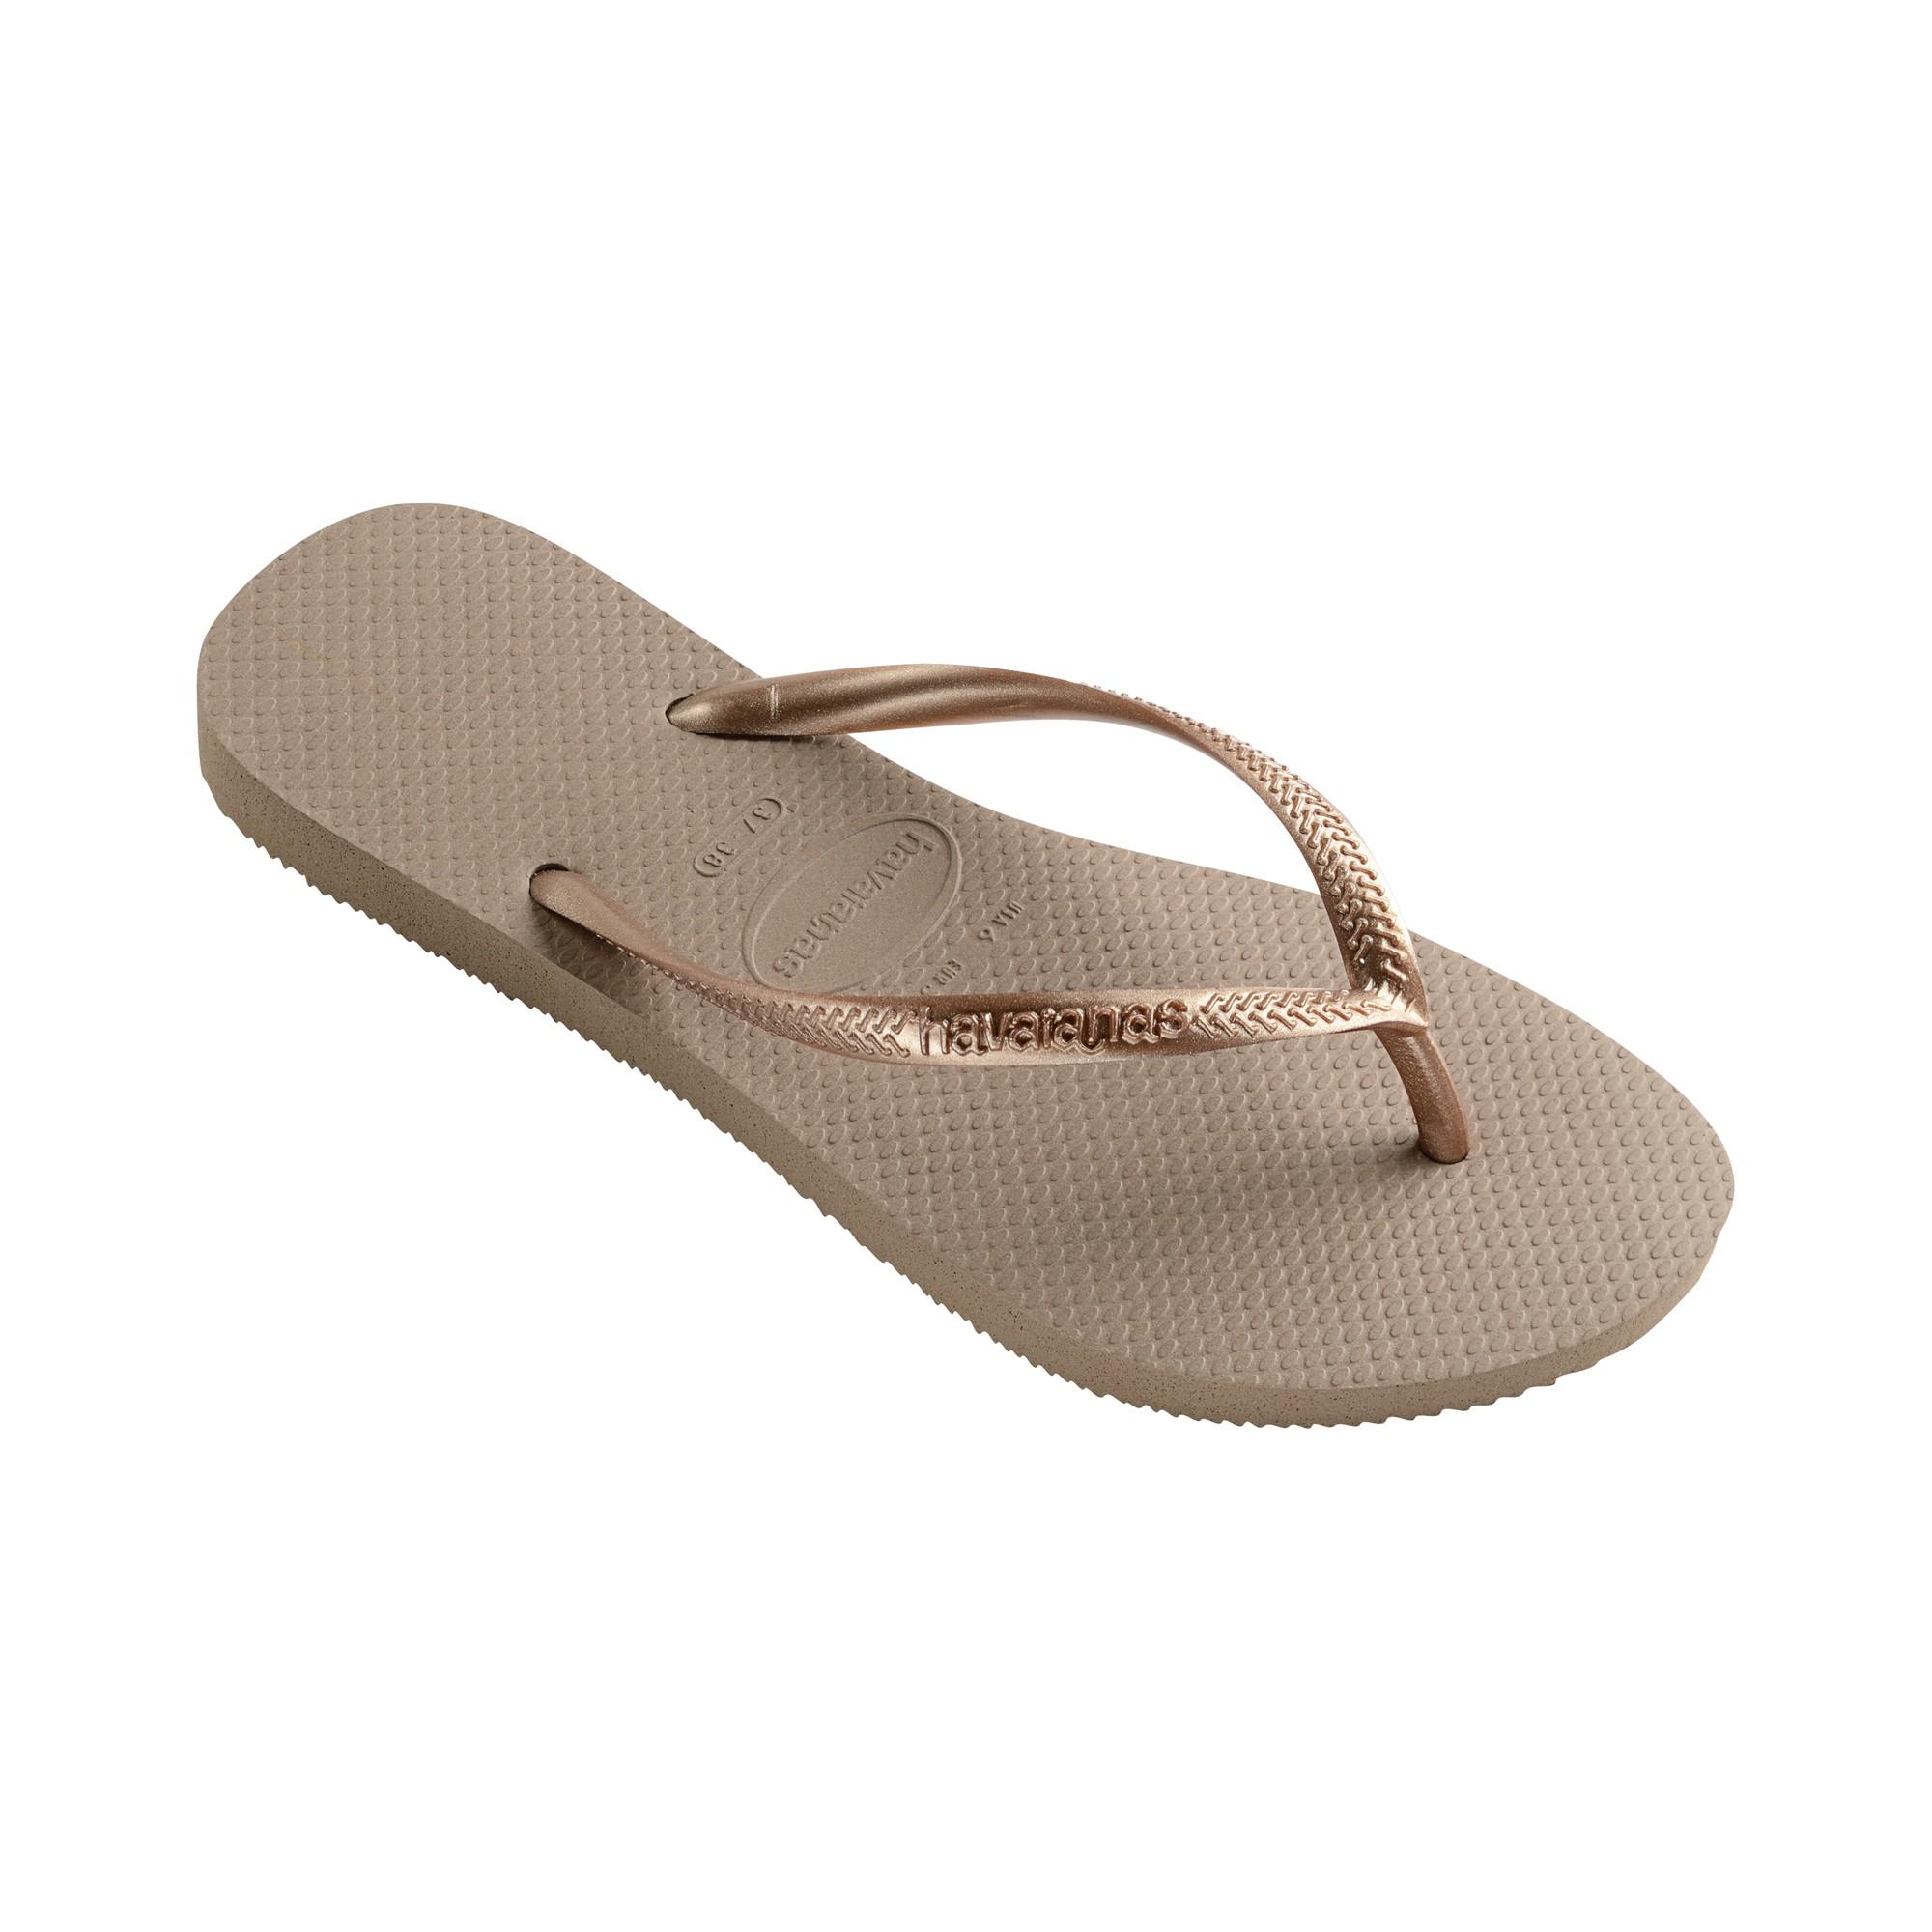 0b6c4249fd90 HAVAIANAS Women s Flip Flops 4000030 ROSE GOLD (3581